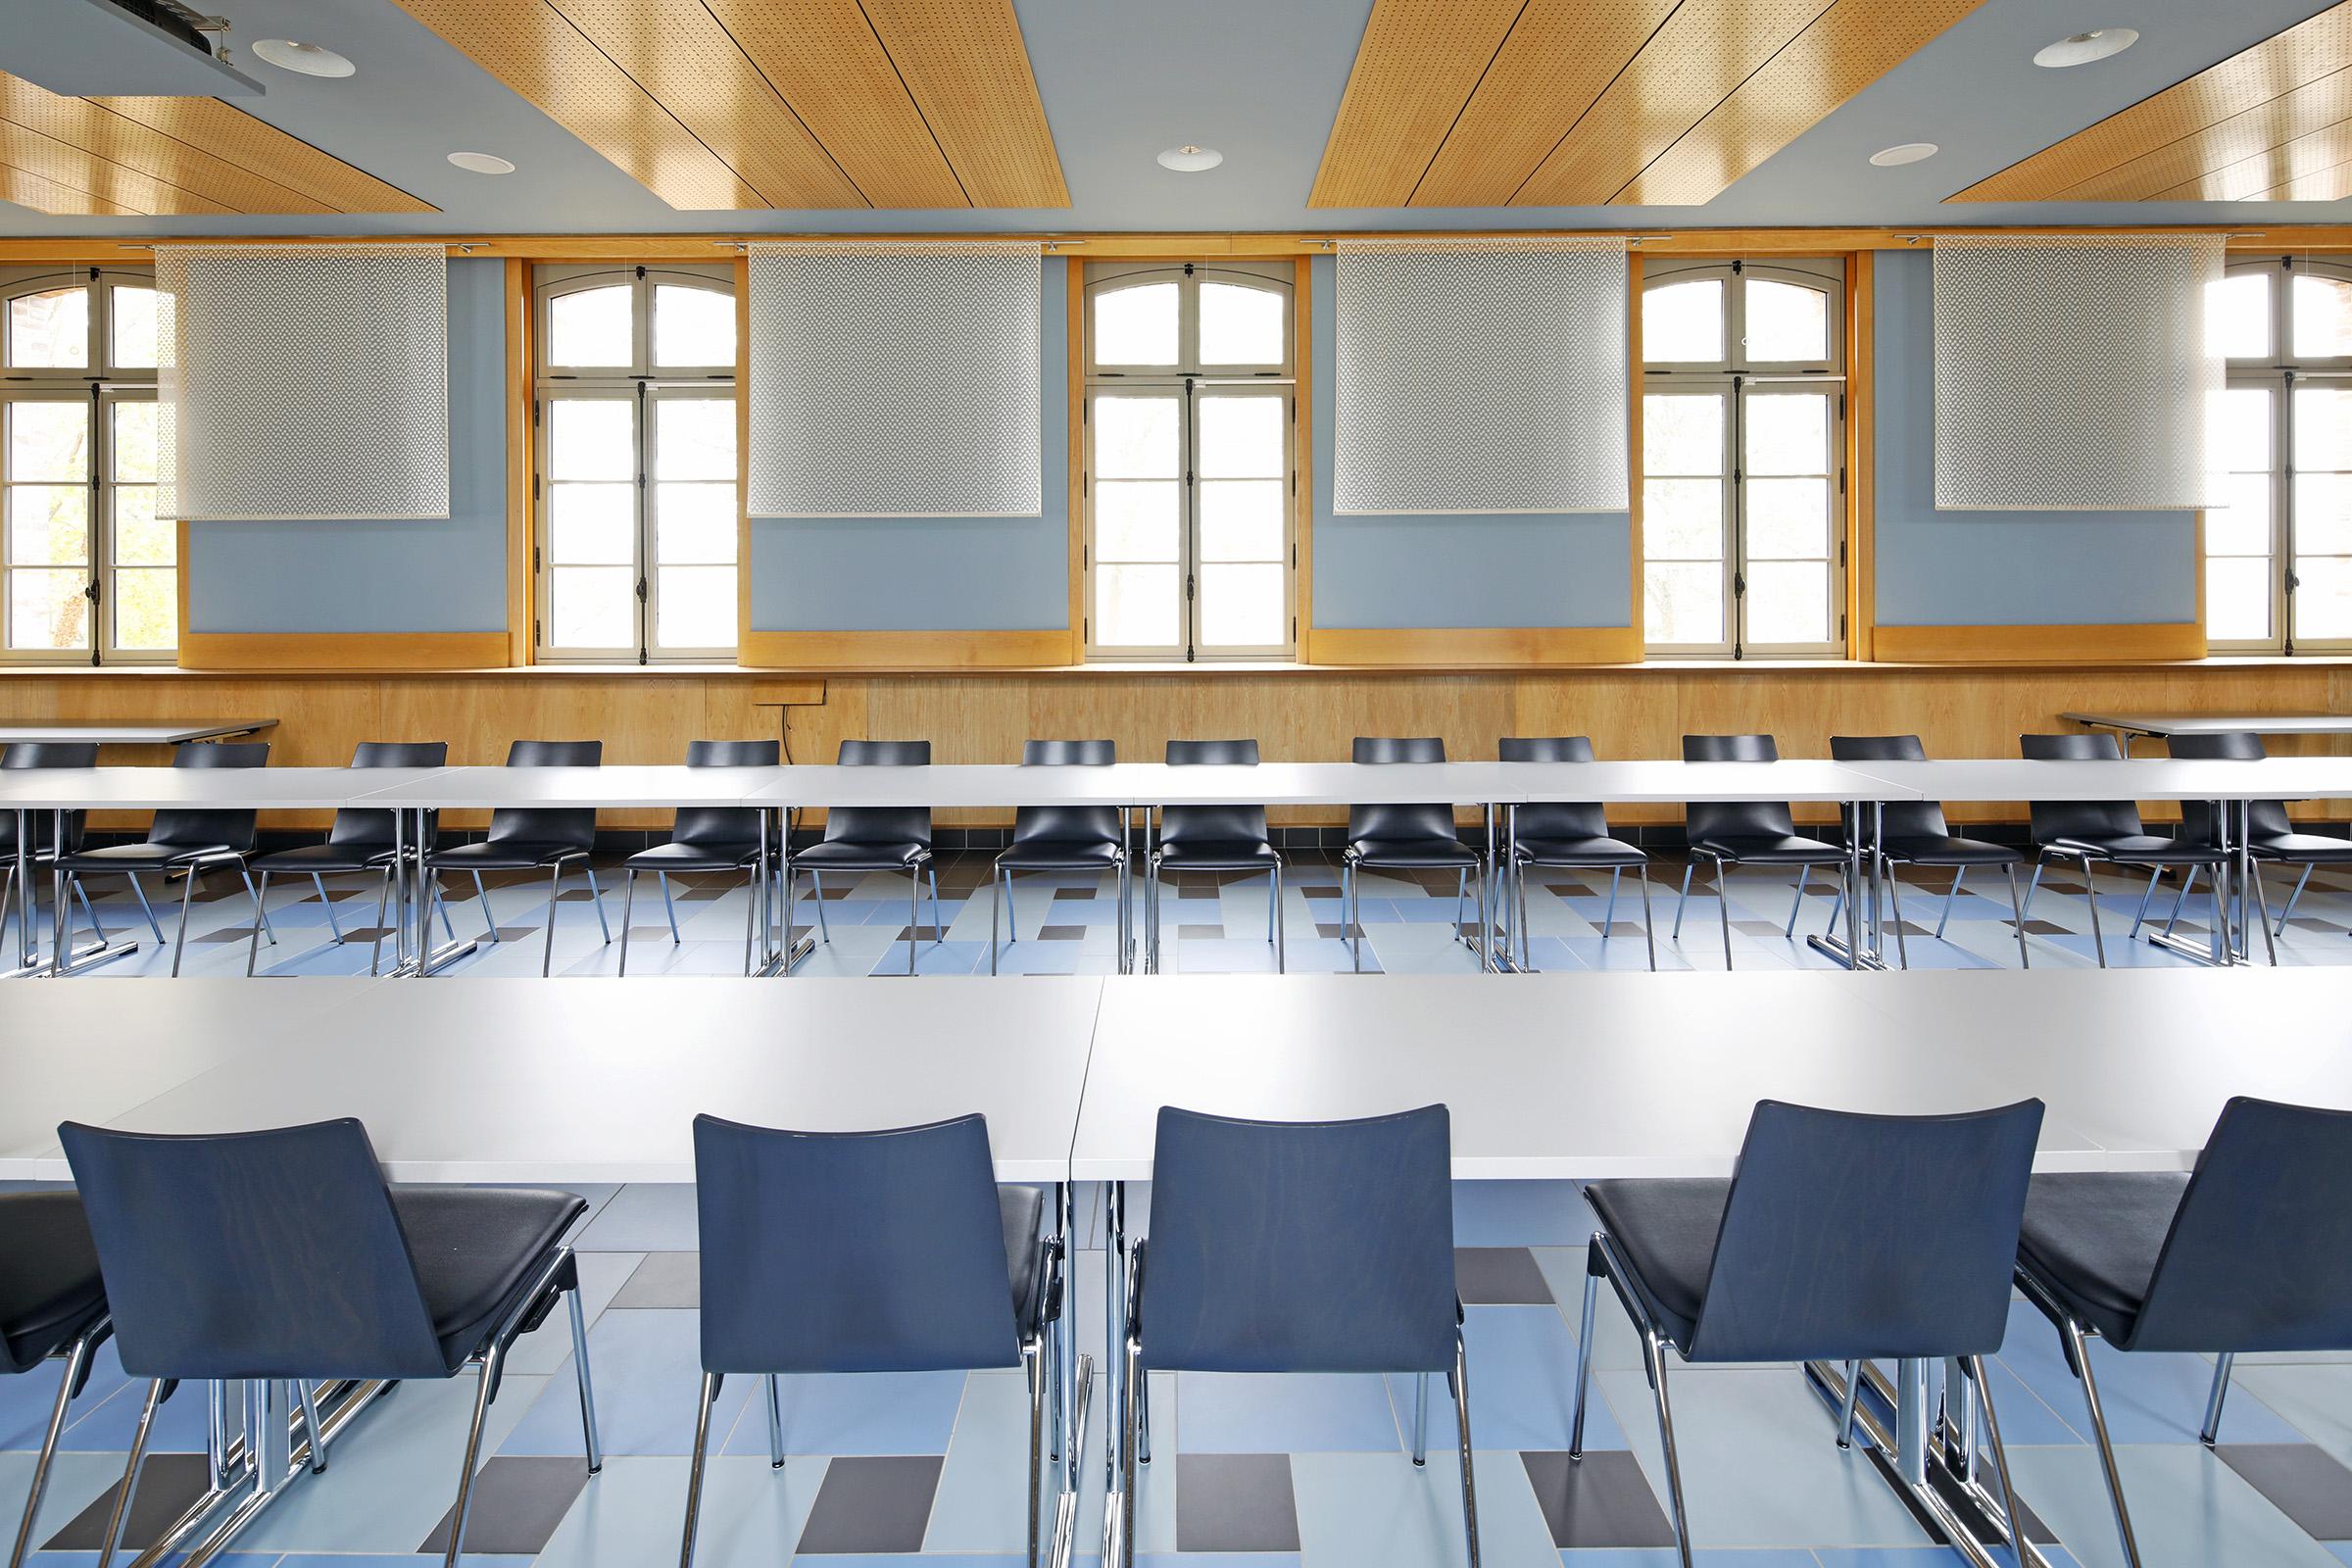 Amilly - La Maison Saint Loup - Interieur - Sylvain Dubuisson 020.jpg